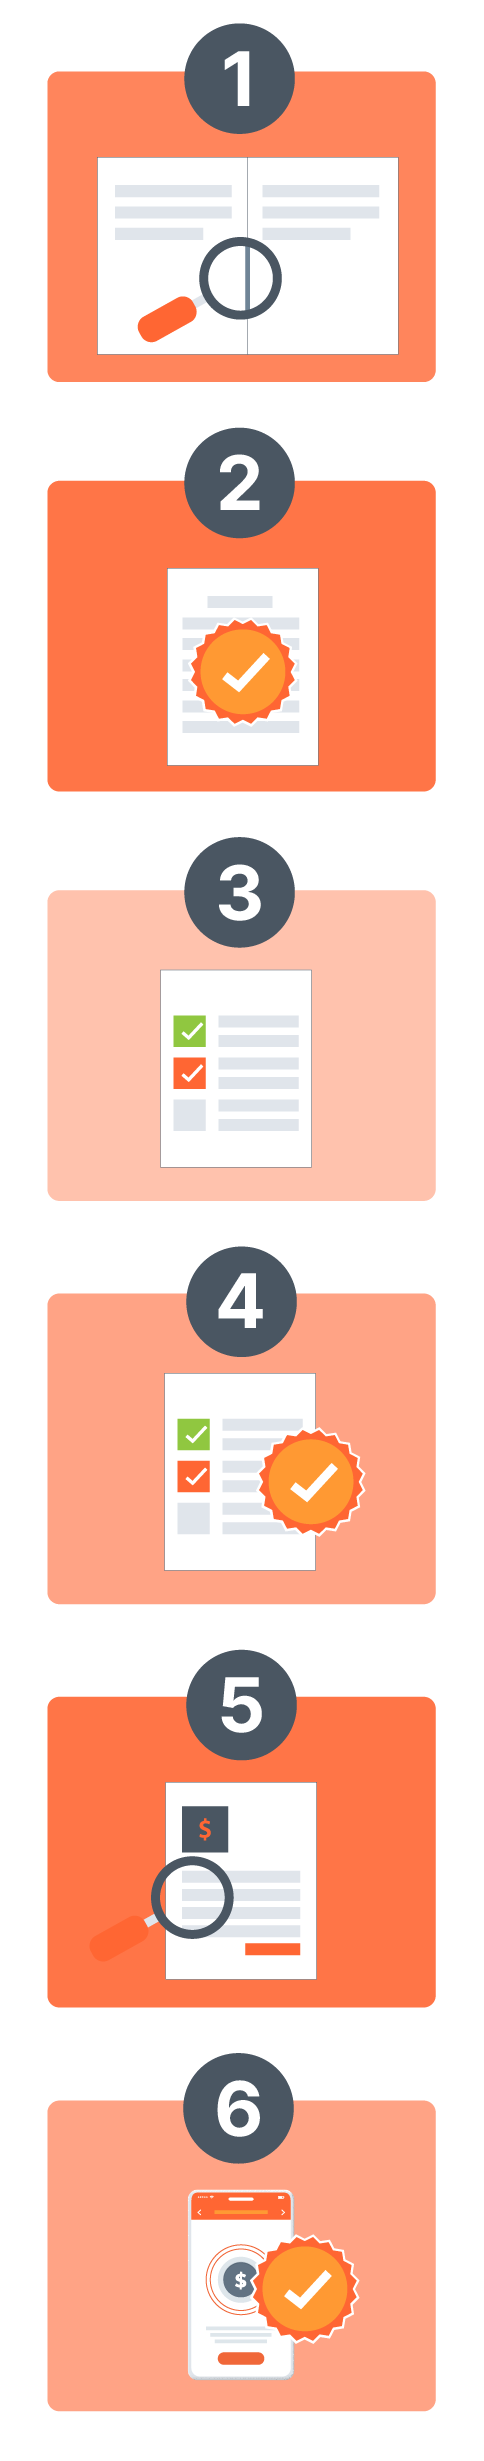 steps of P2P process